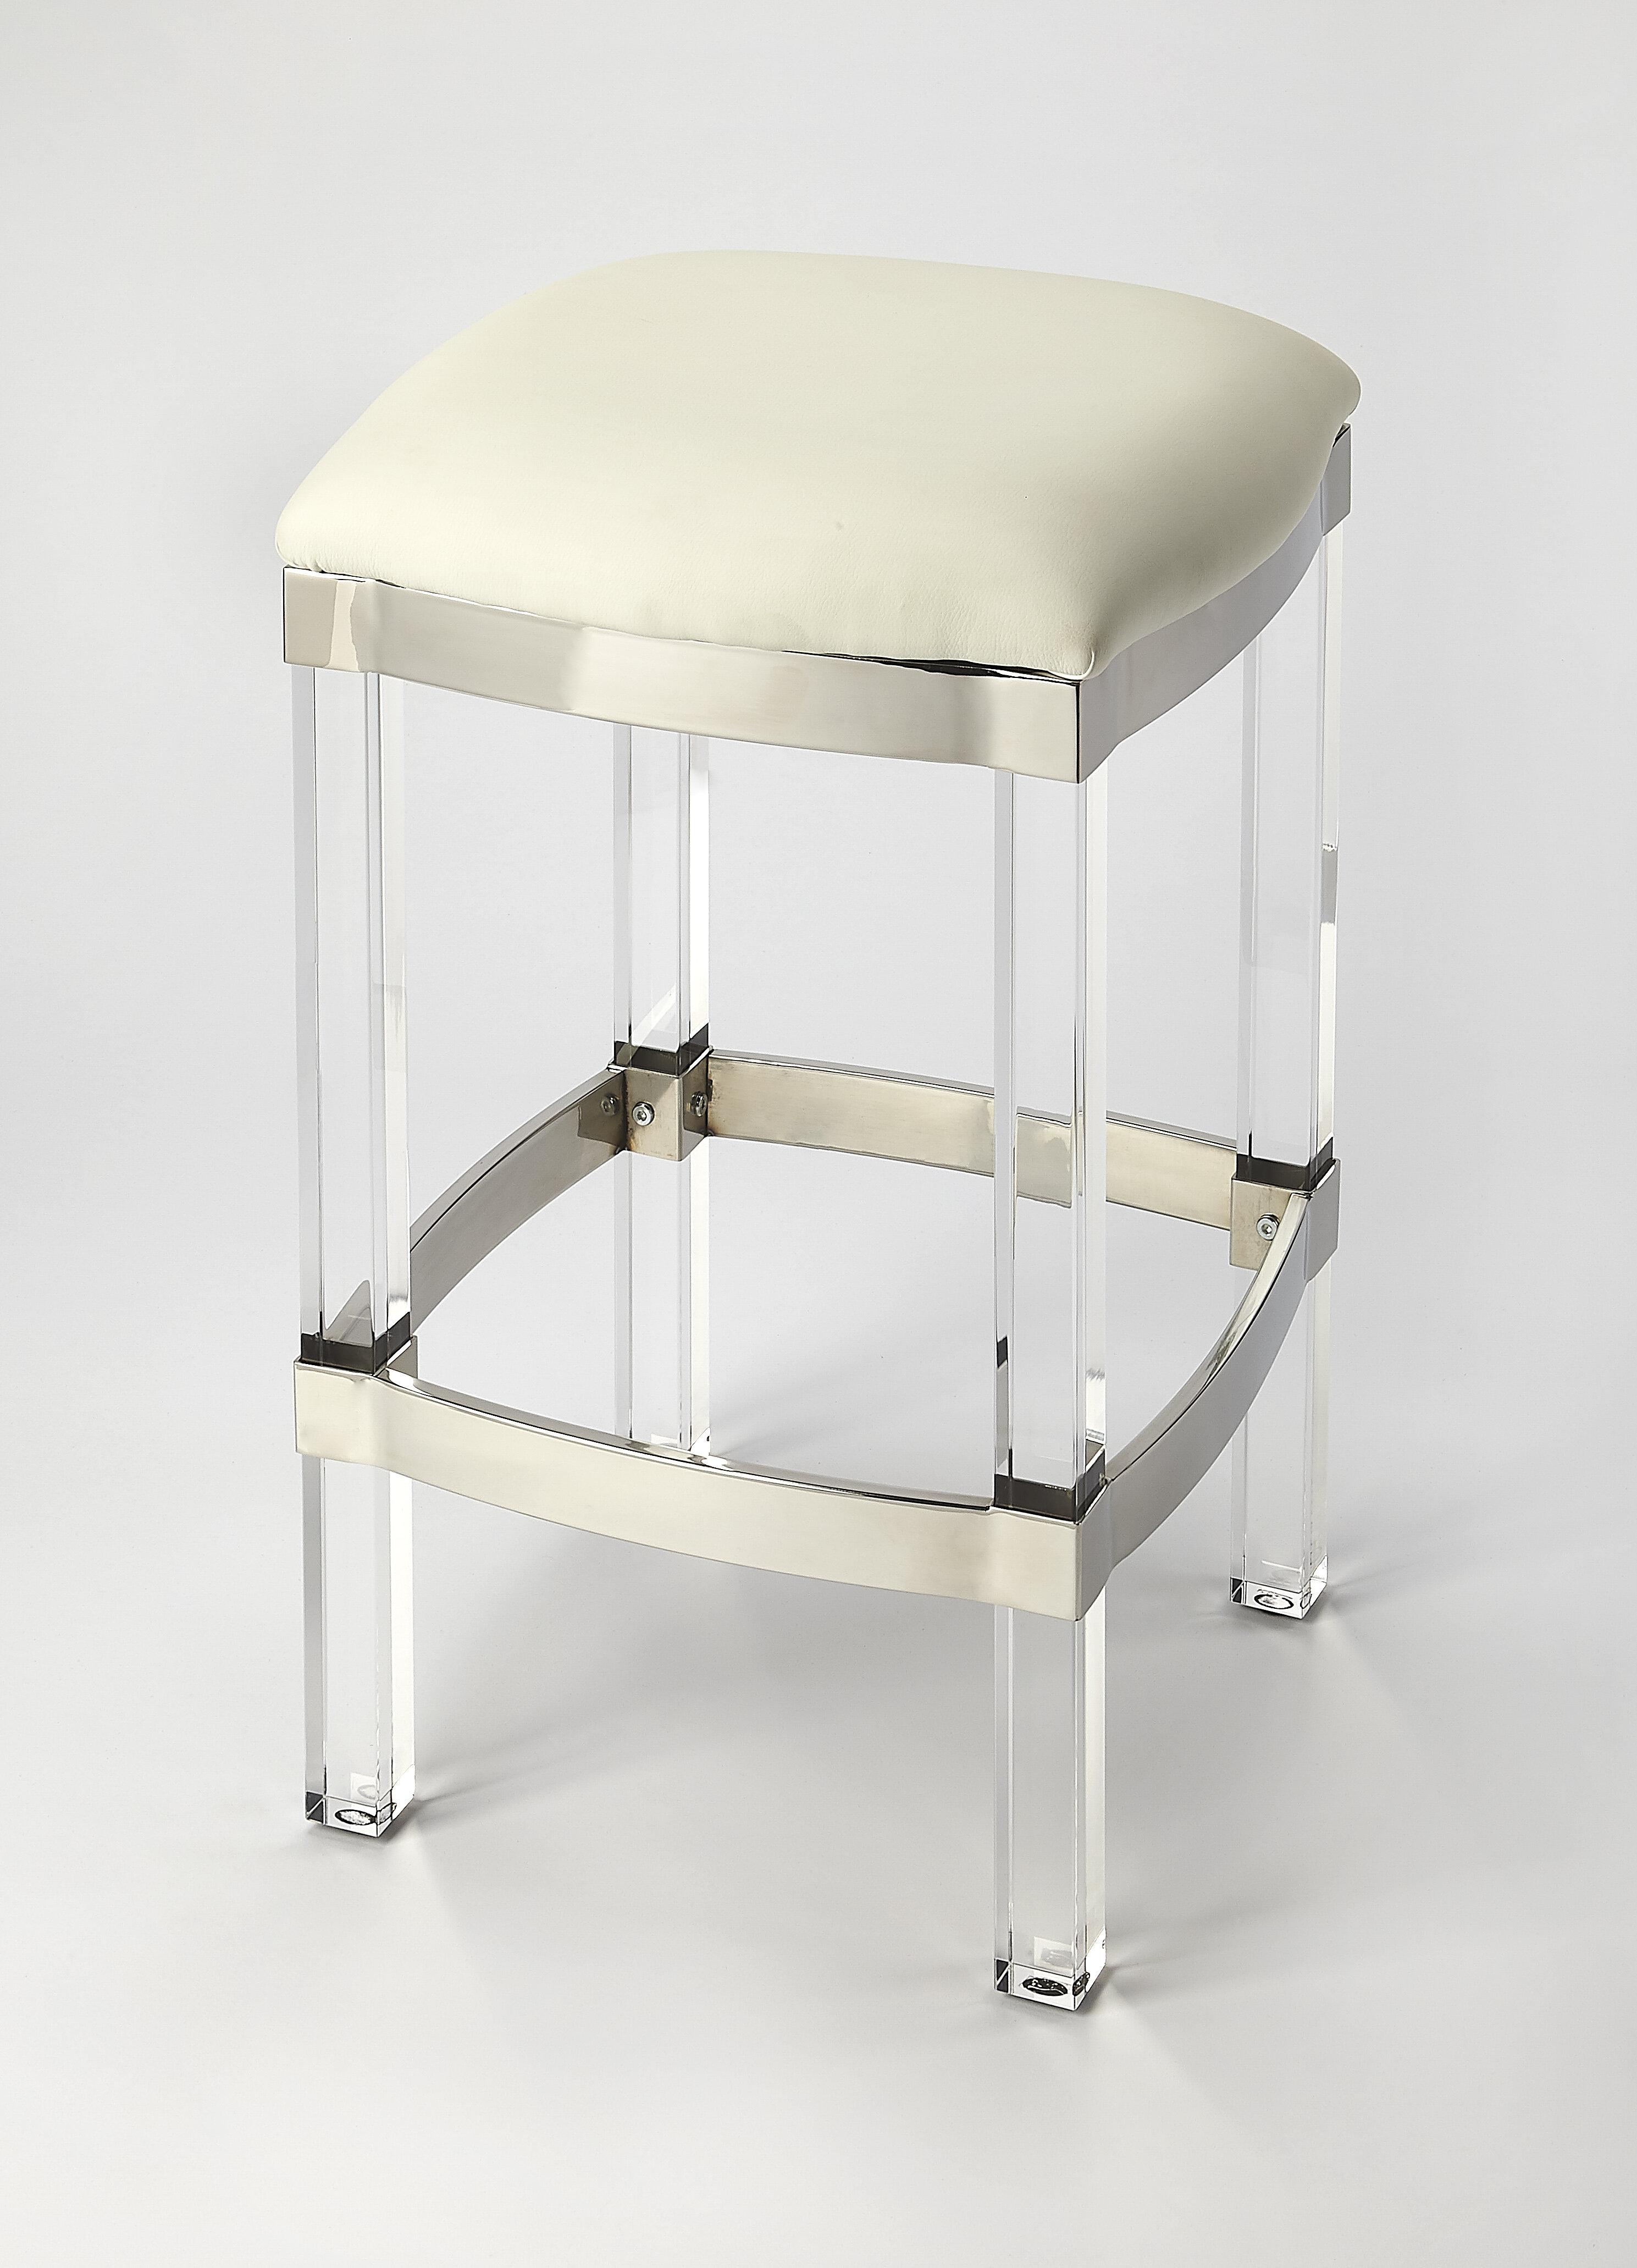 Pleasant Everly Quinn Kye Acrylic And Leather Counter 24 Bar Stool Inzonedesignstudio Interior Chair Design Inzonedesignstudiocom